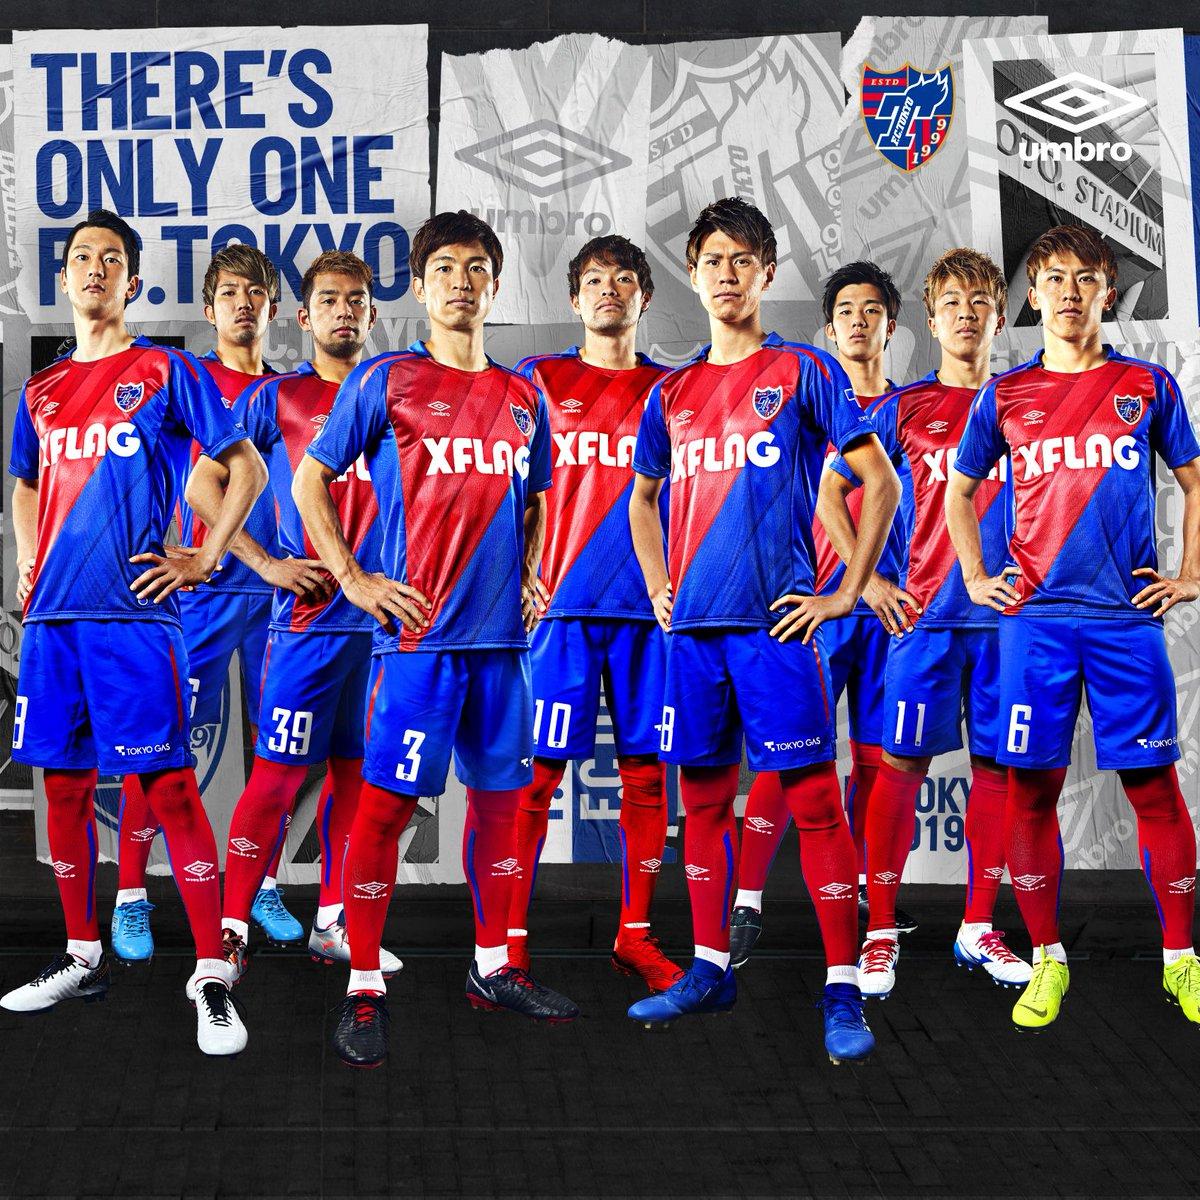 FC東京が2019シーズン新ユニフォームを発表 9年ぶりの胸スポンサー変更で「XFLAG」に